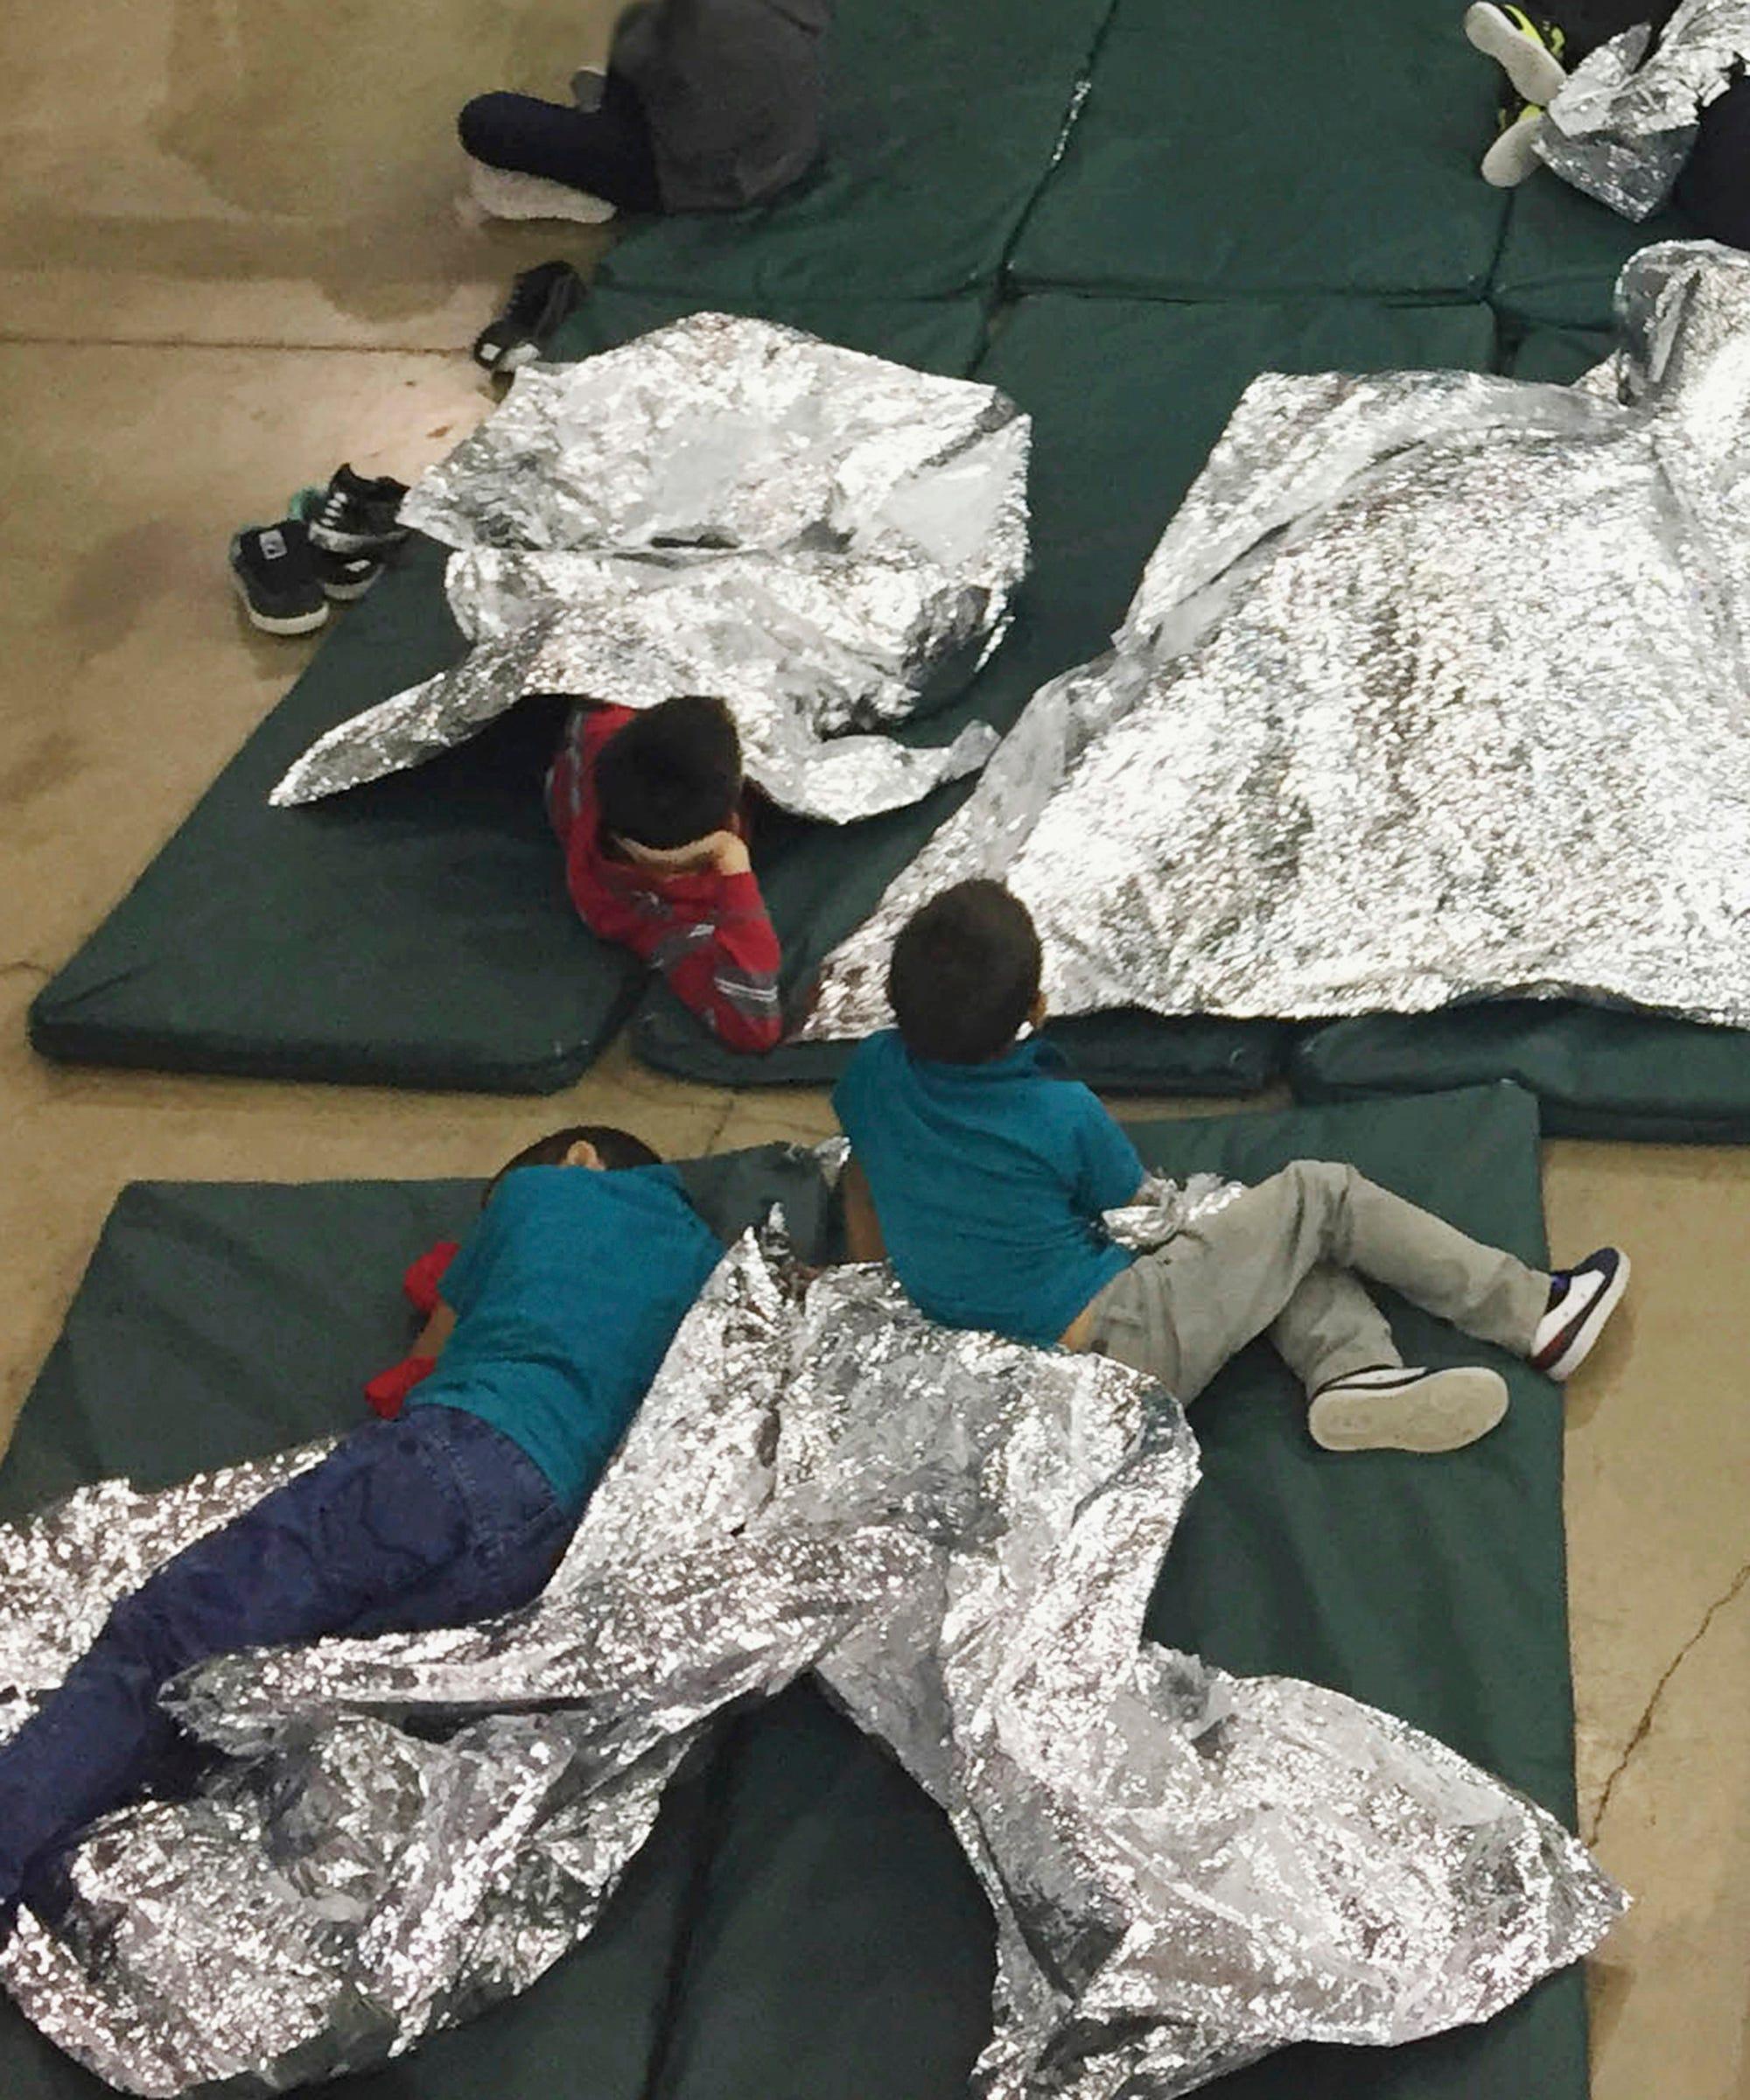 Border Patrol, U.S. Border Patrol